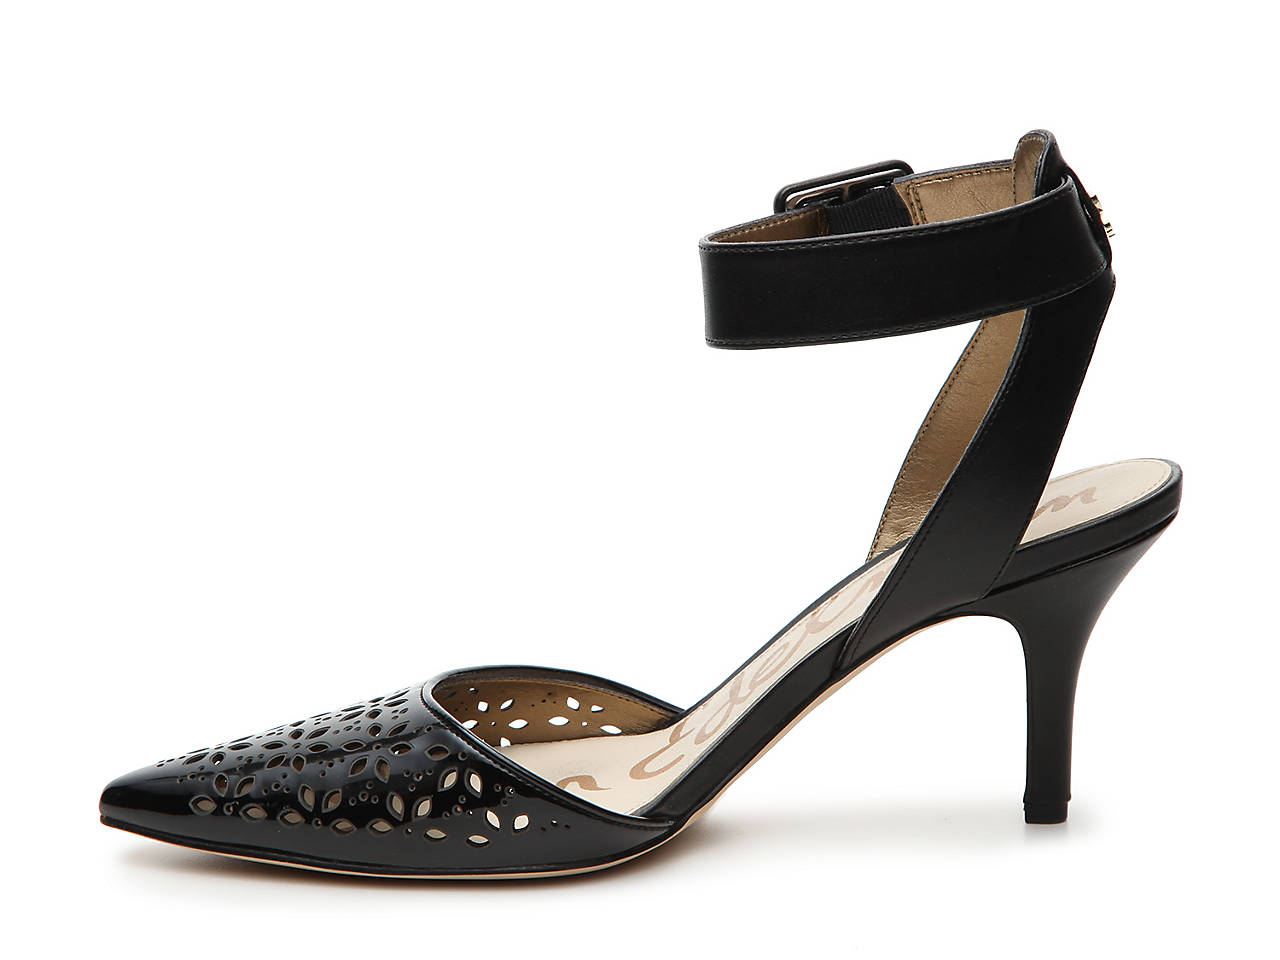 81cde9ce98d26 Sam Edelman Odynna Pump Women s Shoes